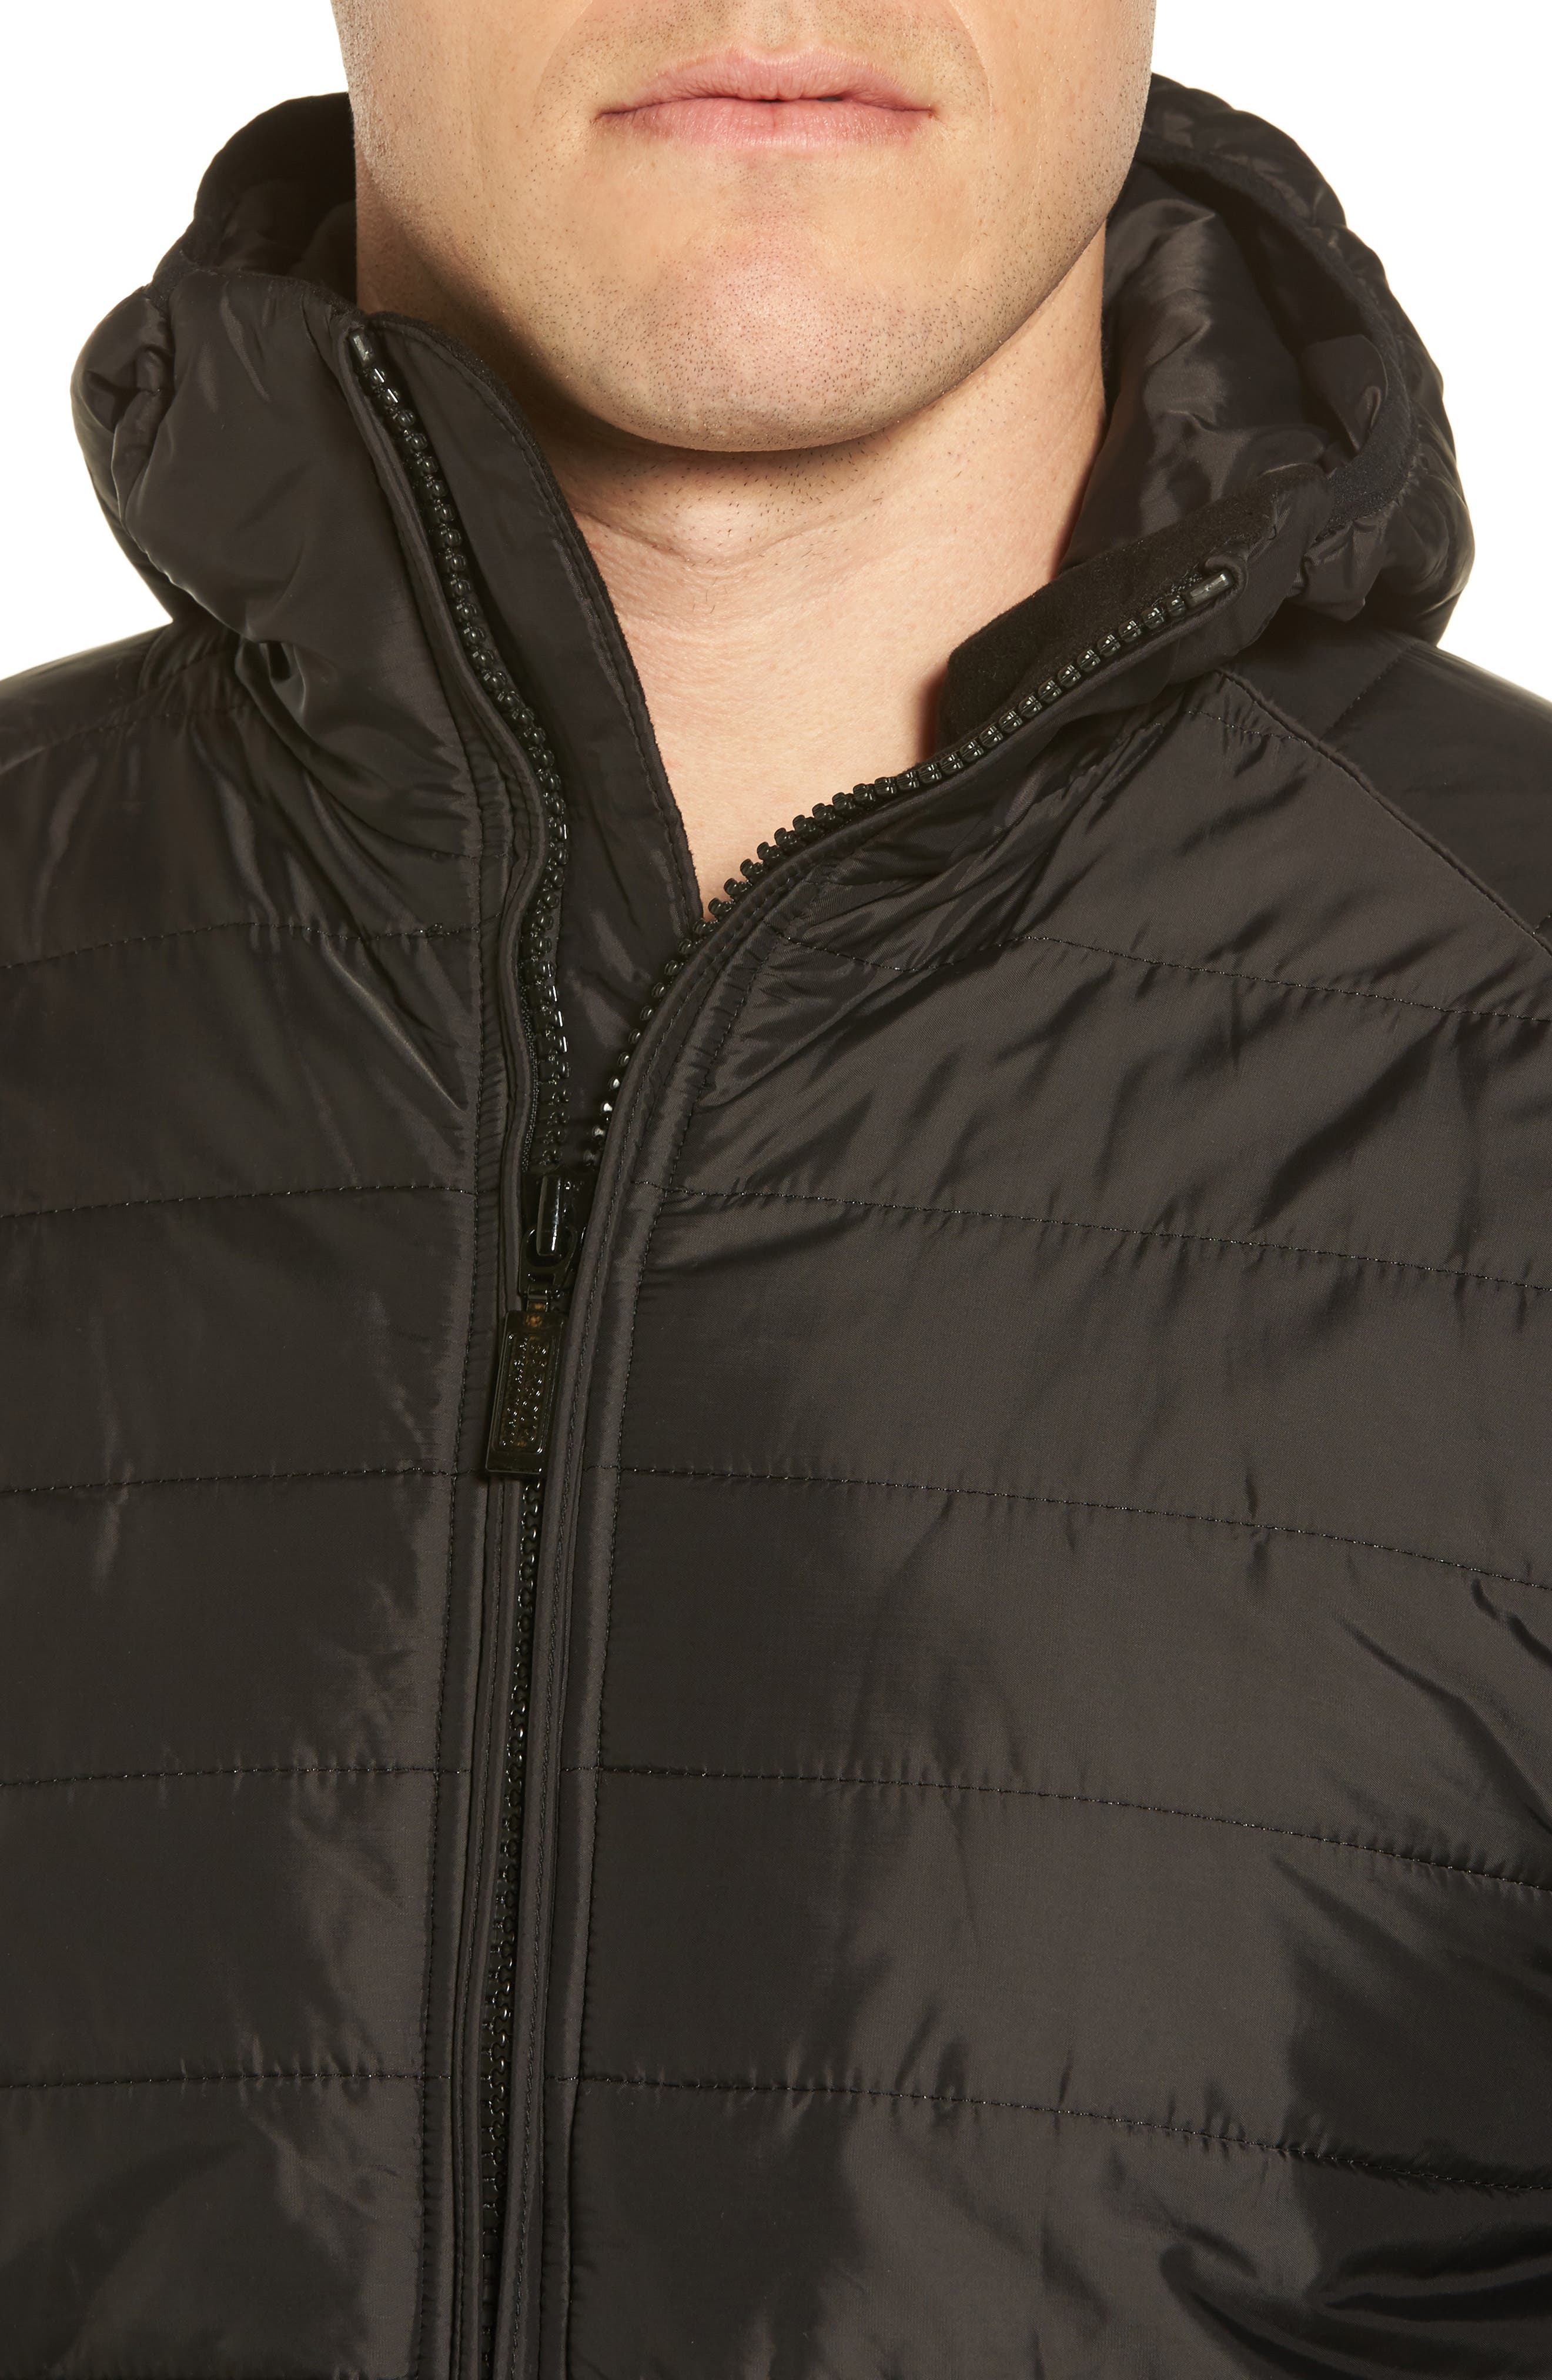 International Level Slim Fit Quilted Hooded Jacket,                             Alternate thumbnail 4, color,                             Black